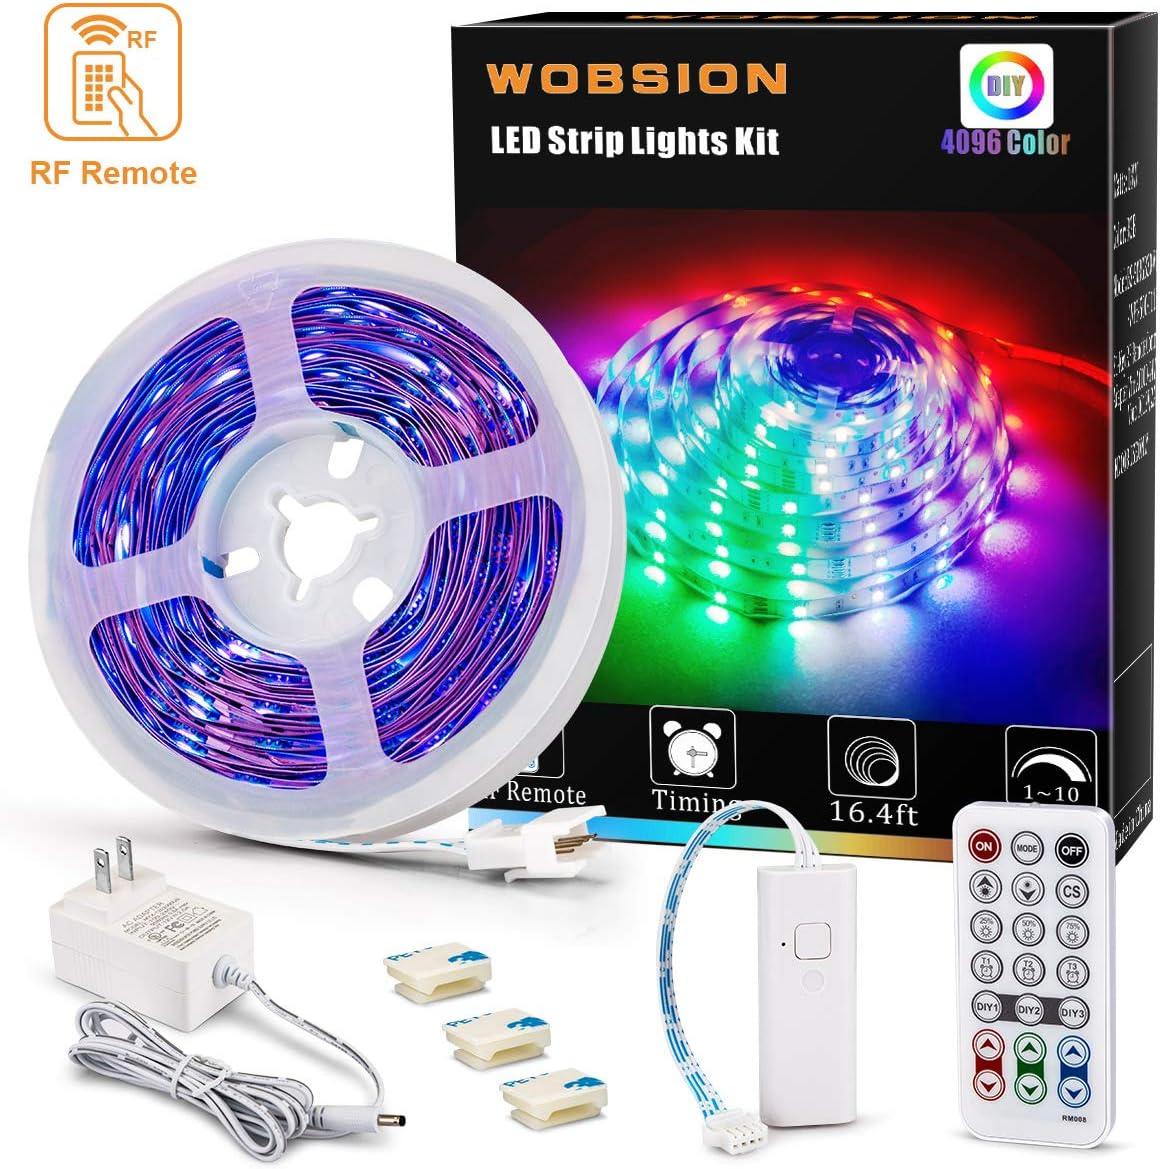 wobsion Color Changing Led Strip Lights, 16.4ft 4096 DIY Colors Flexible Strip Lights with RF Remote, 12V RGB Led Strip Lights, SMD 5050 LEDs,Light Strips for Kitchen,Bedroom,Room Decoration